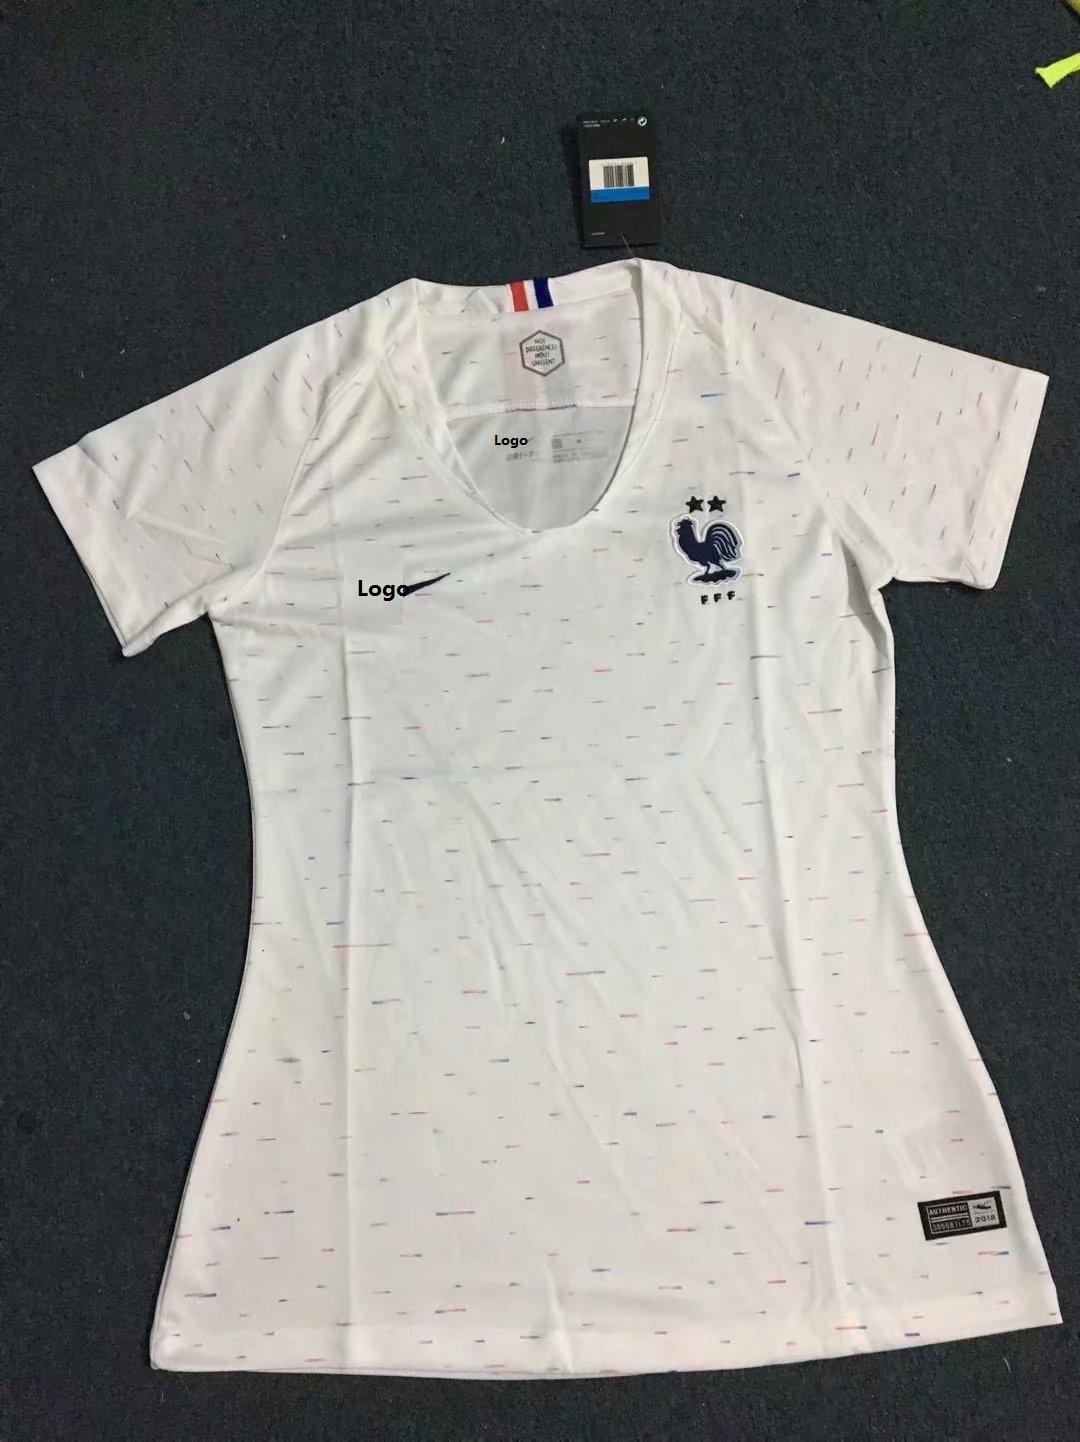 new product 0614e 803b8 2018/19 Women Thai Fan Version France Two Star White Soccer Jerseys